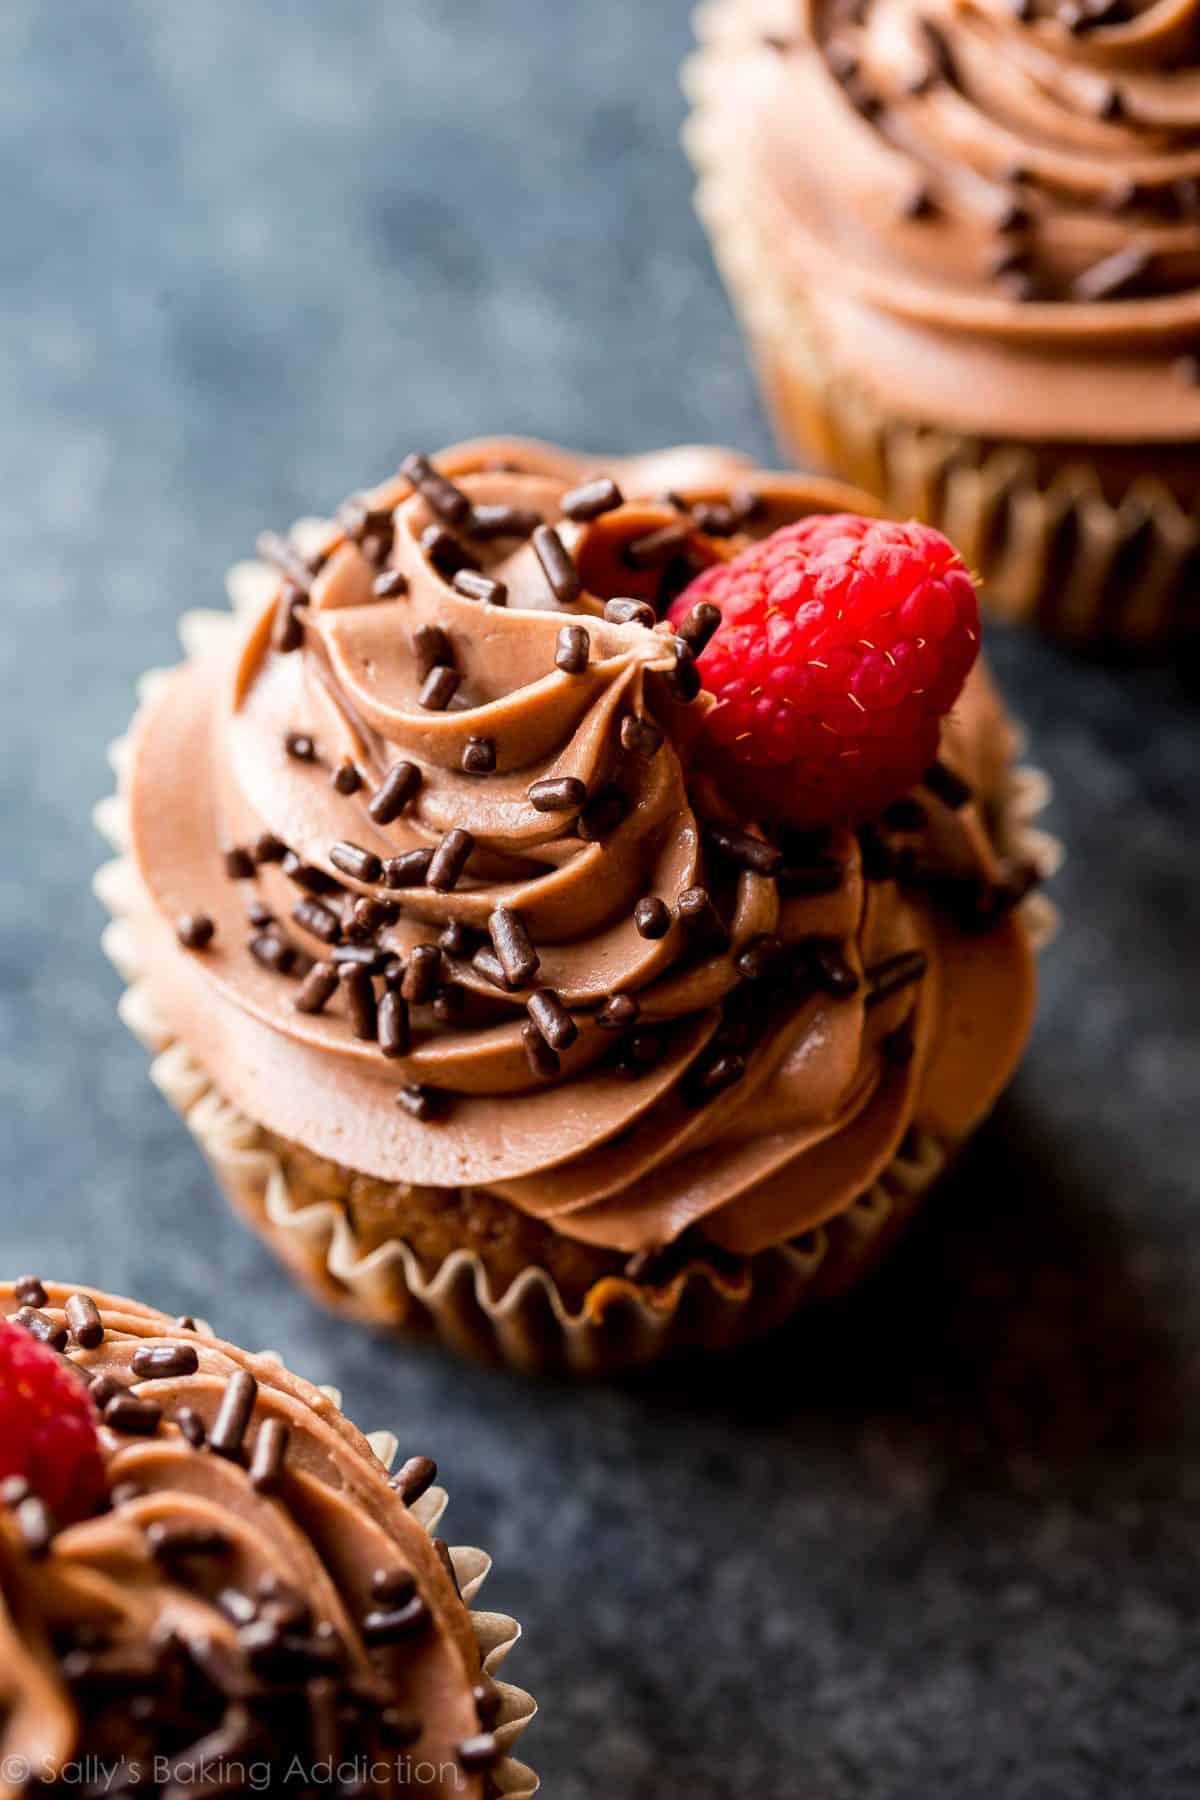 Mocha Nutella Cupcakes - Sallys Baking Addiction